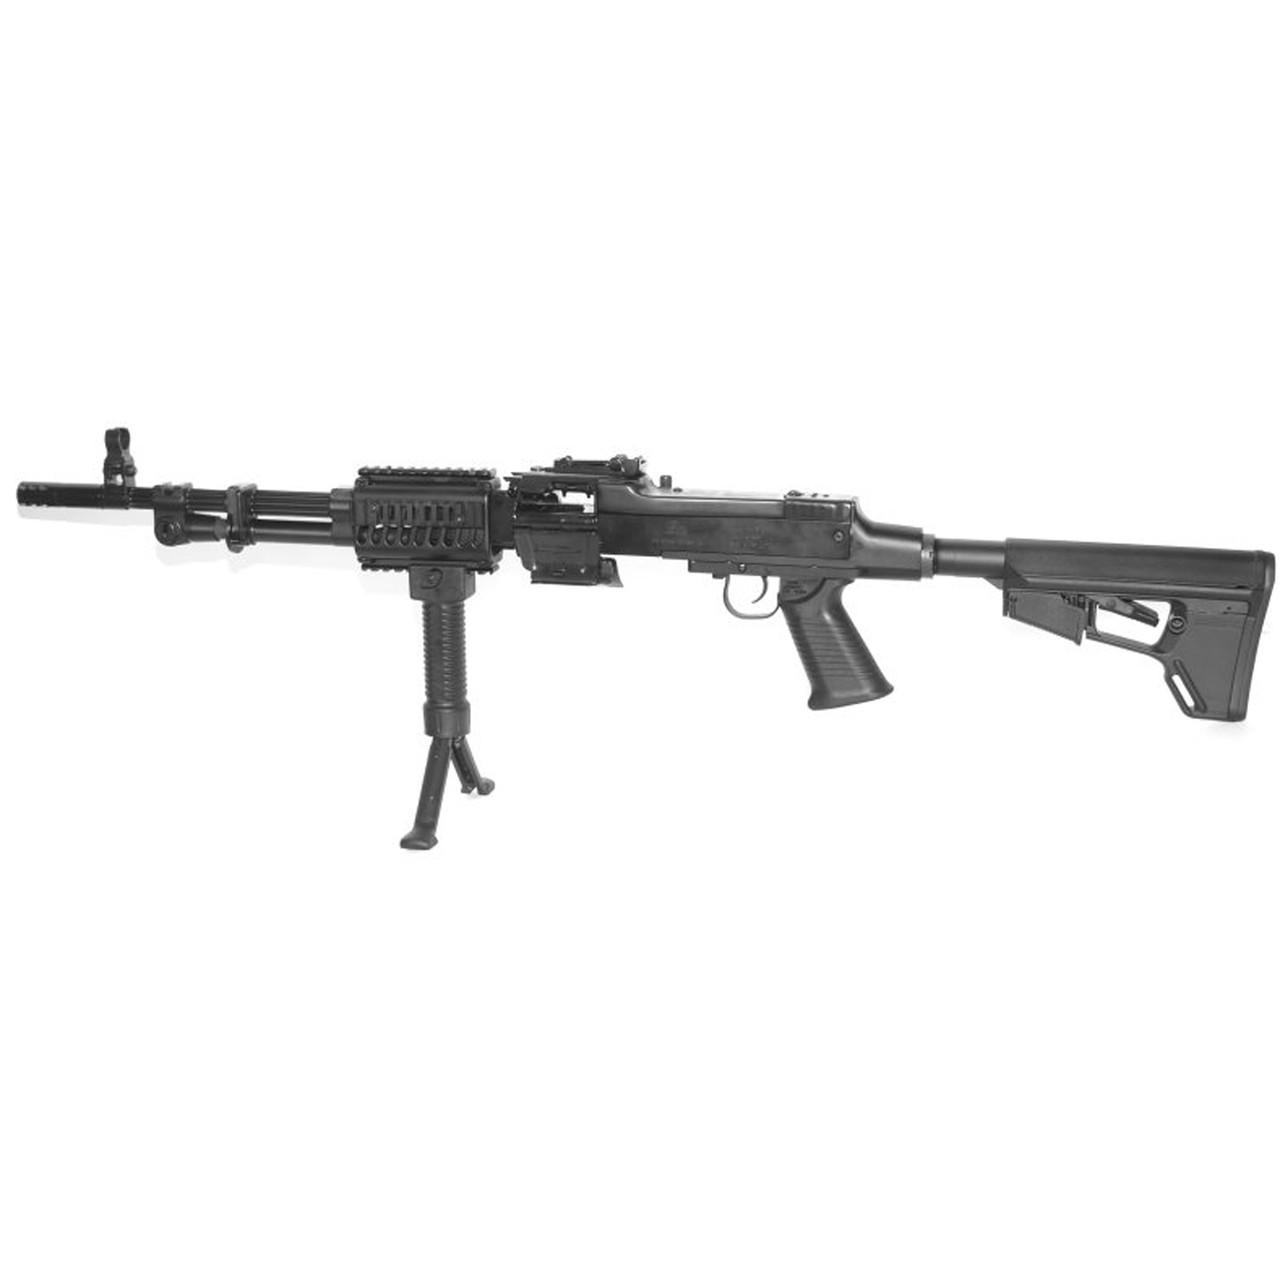 DS Arms  RPD Carbine California Legal - 7.62x39